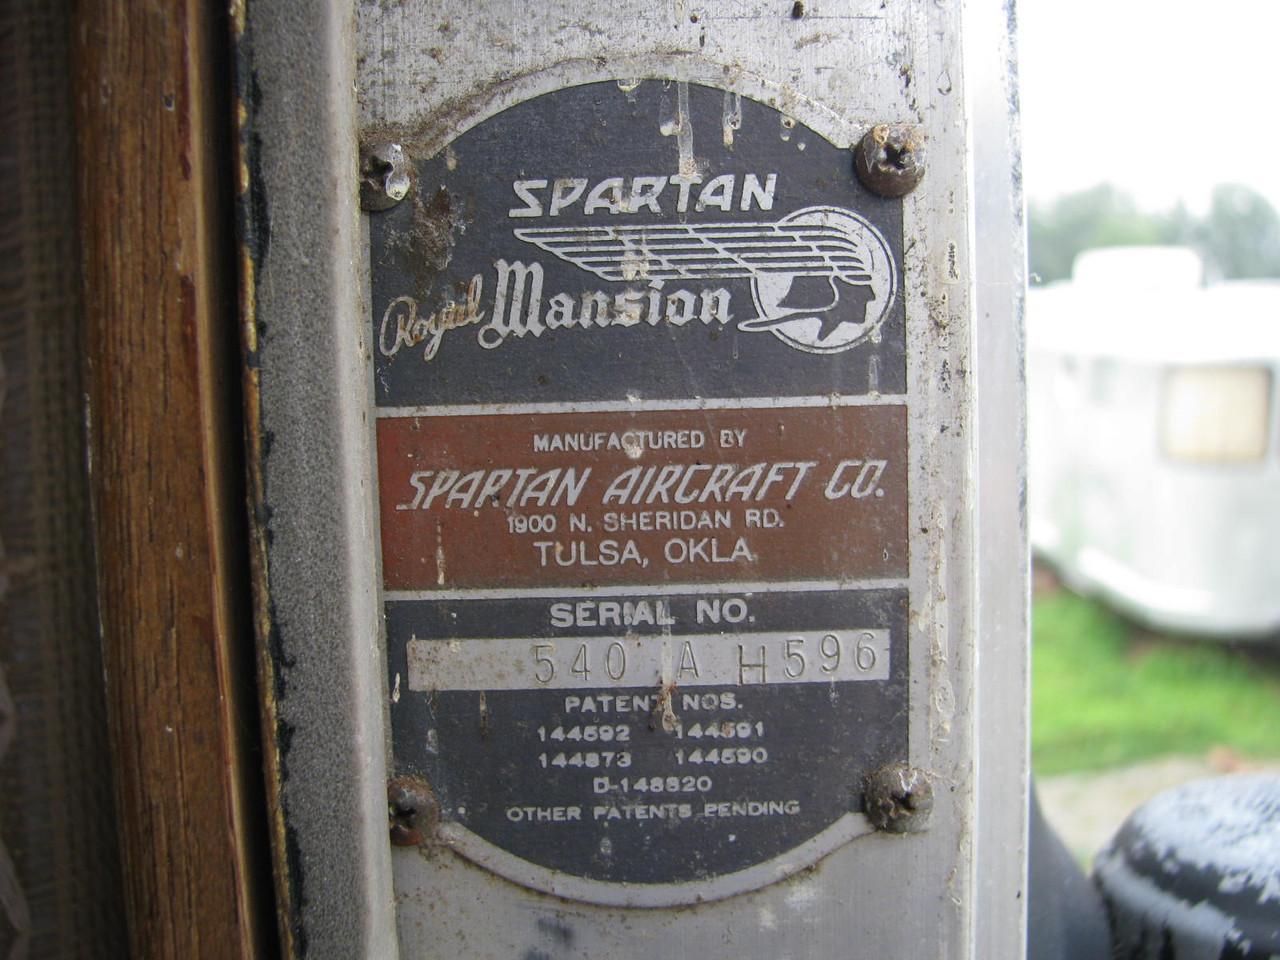 1957 Spartan 40' Royal Mansion #596